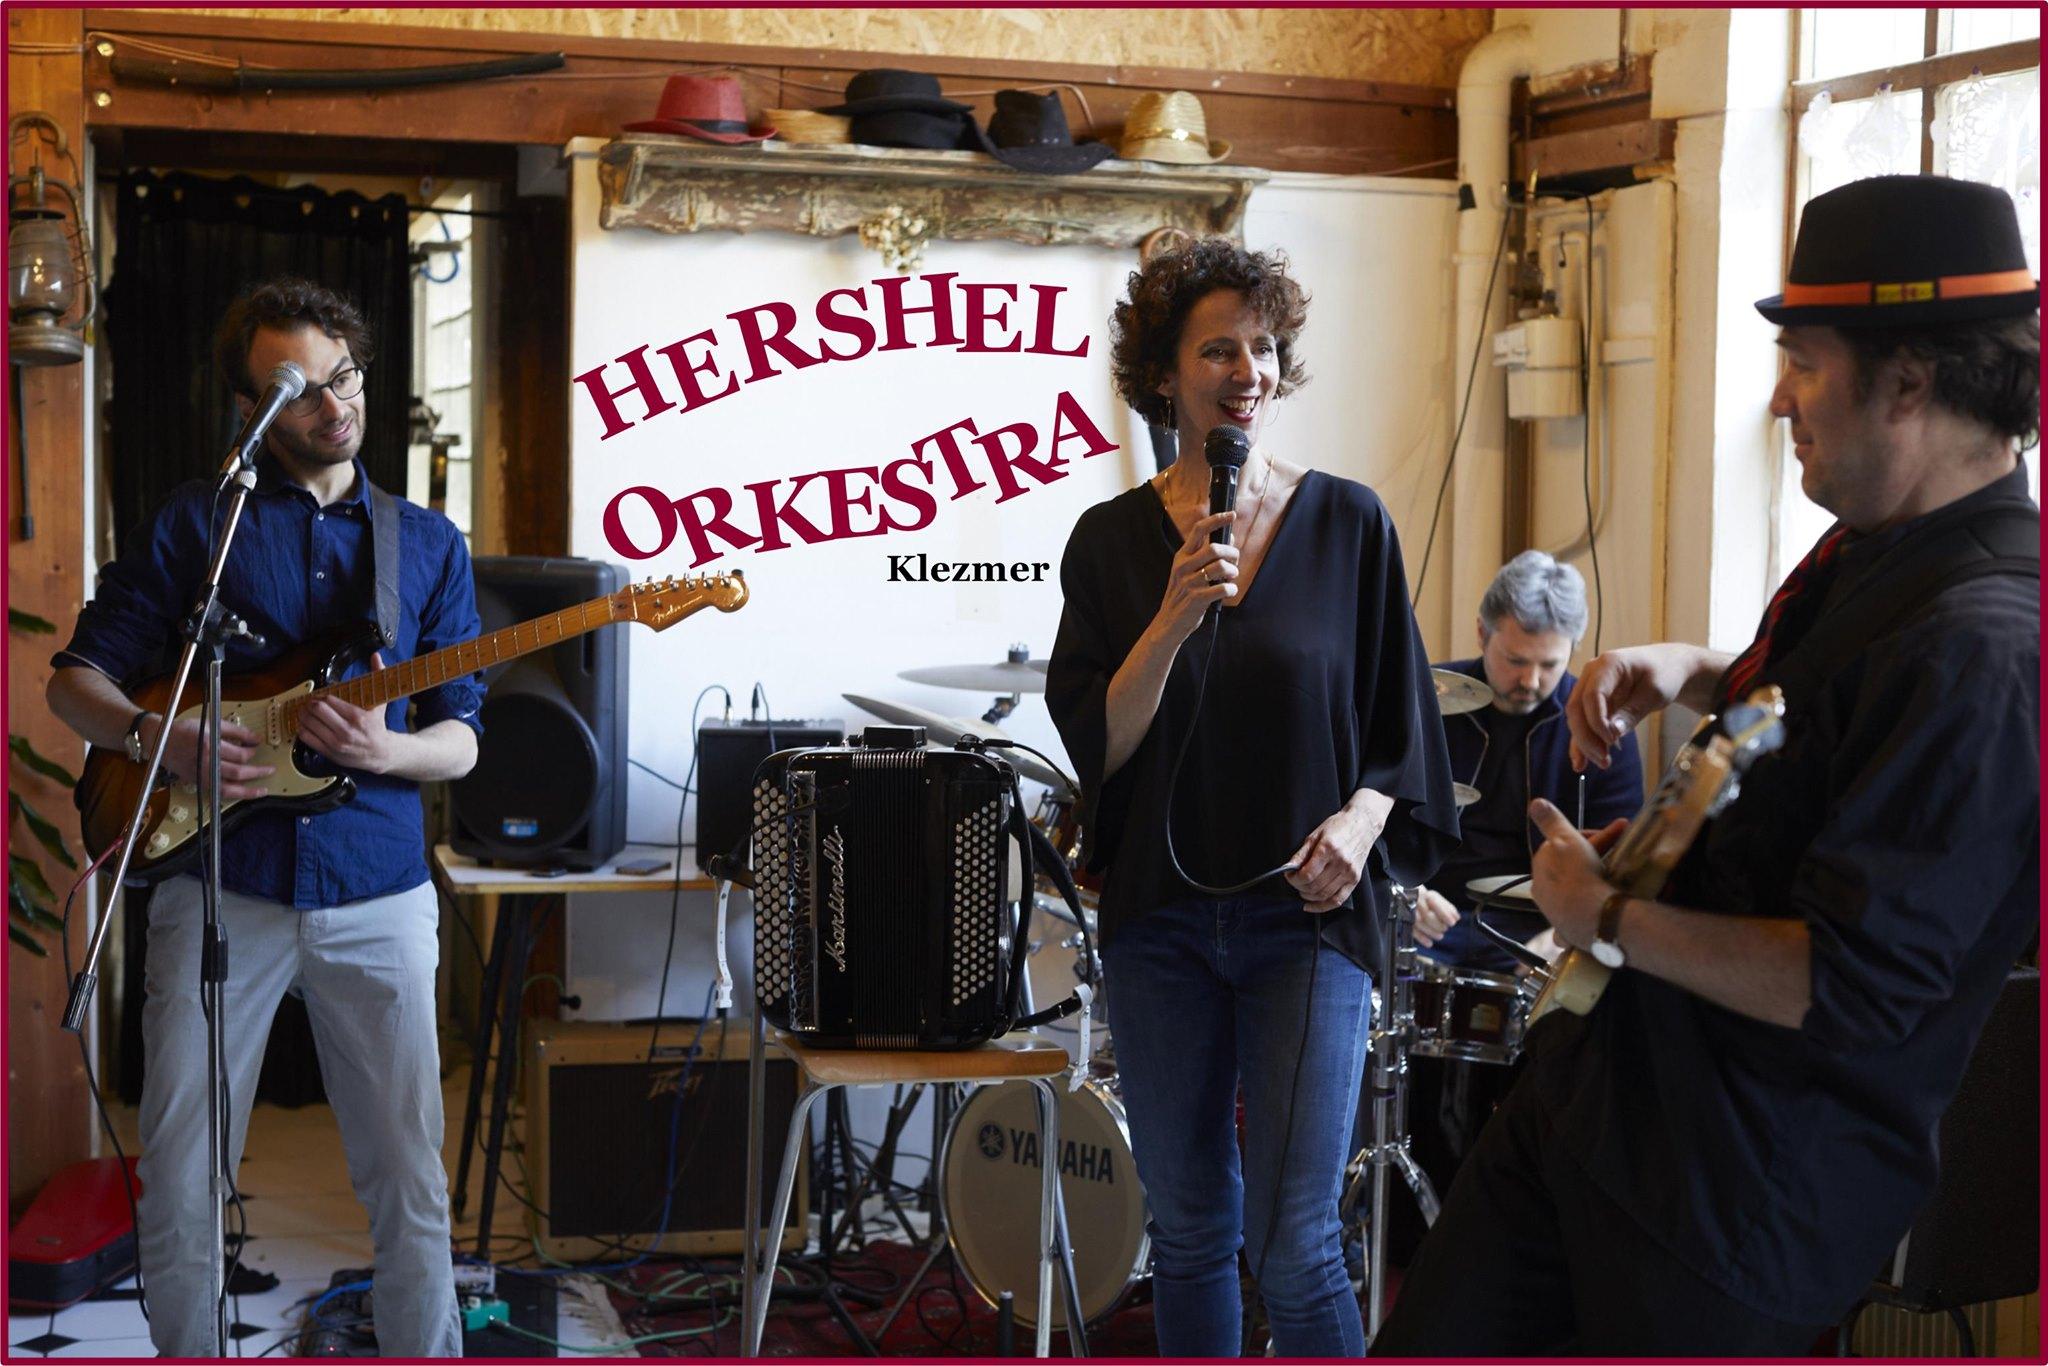 Hershel Orkestra, avec Dominique Schiff